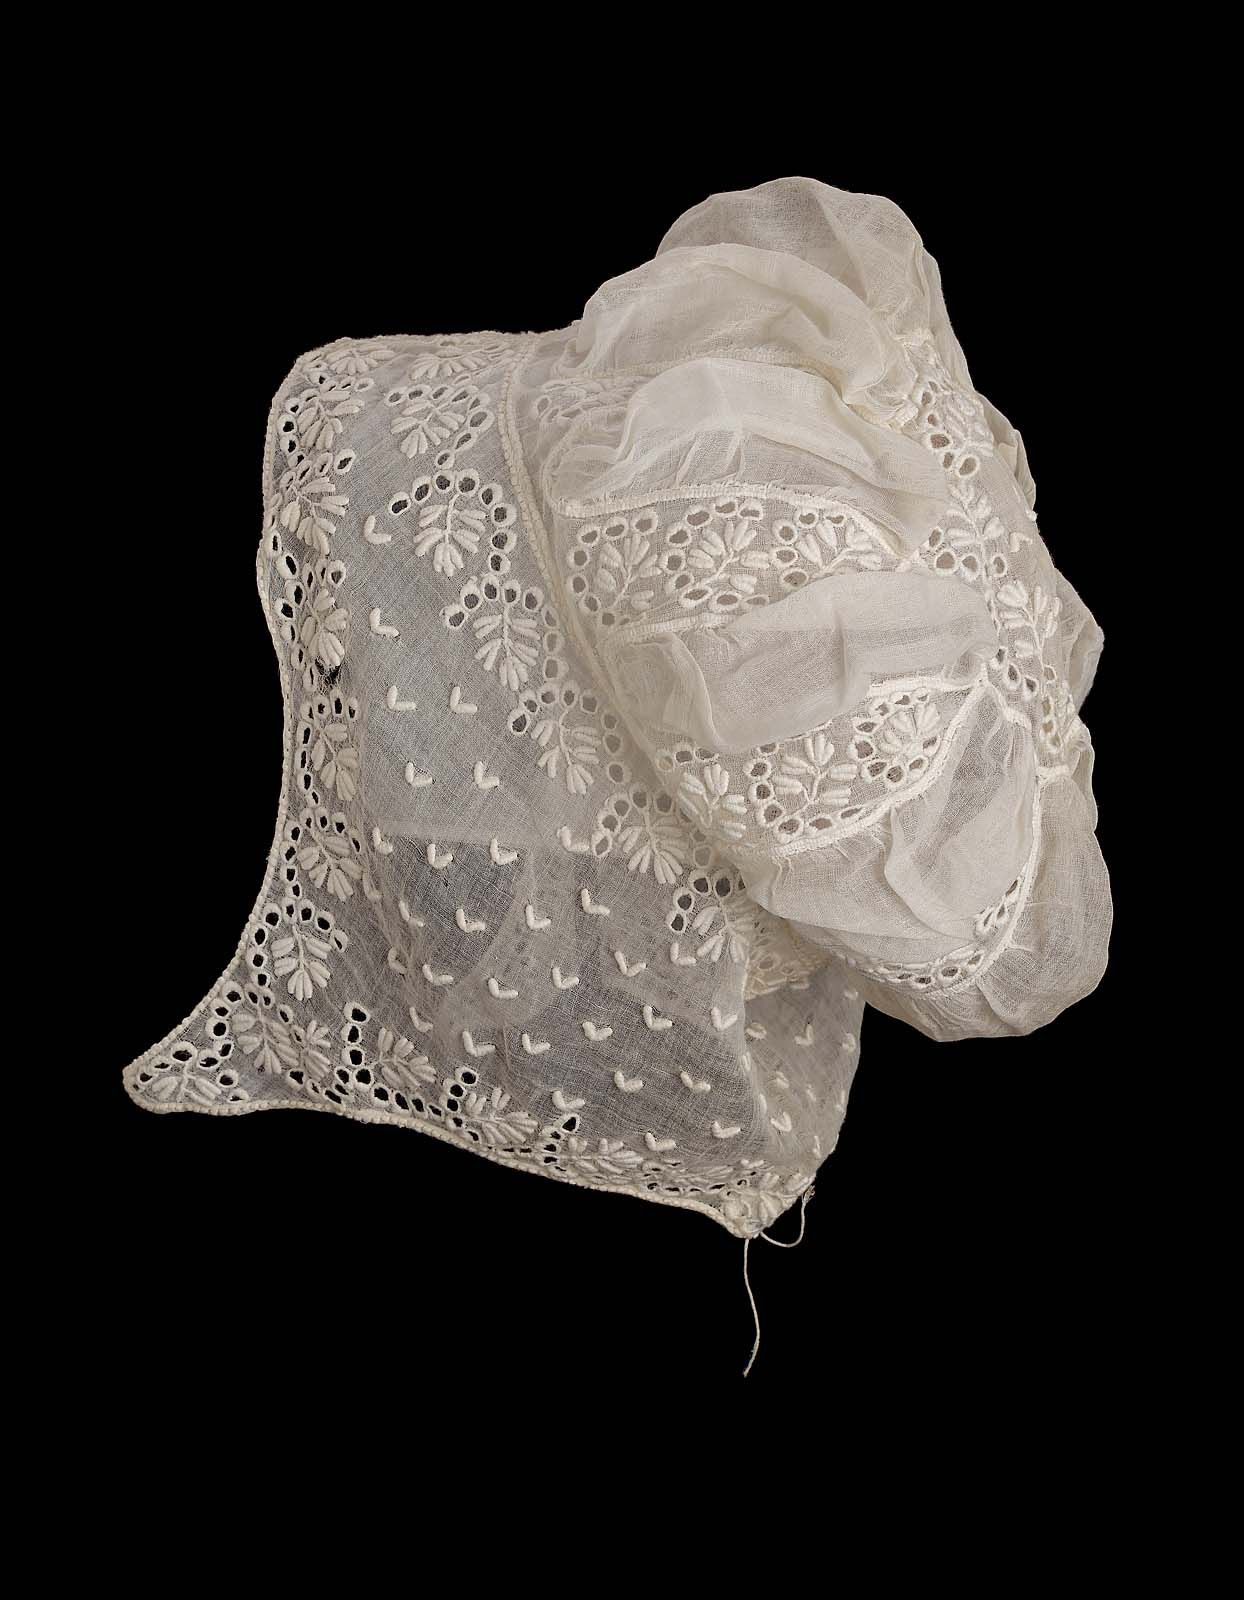 Woman's cap | Museum of Fine Arts, Boston